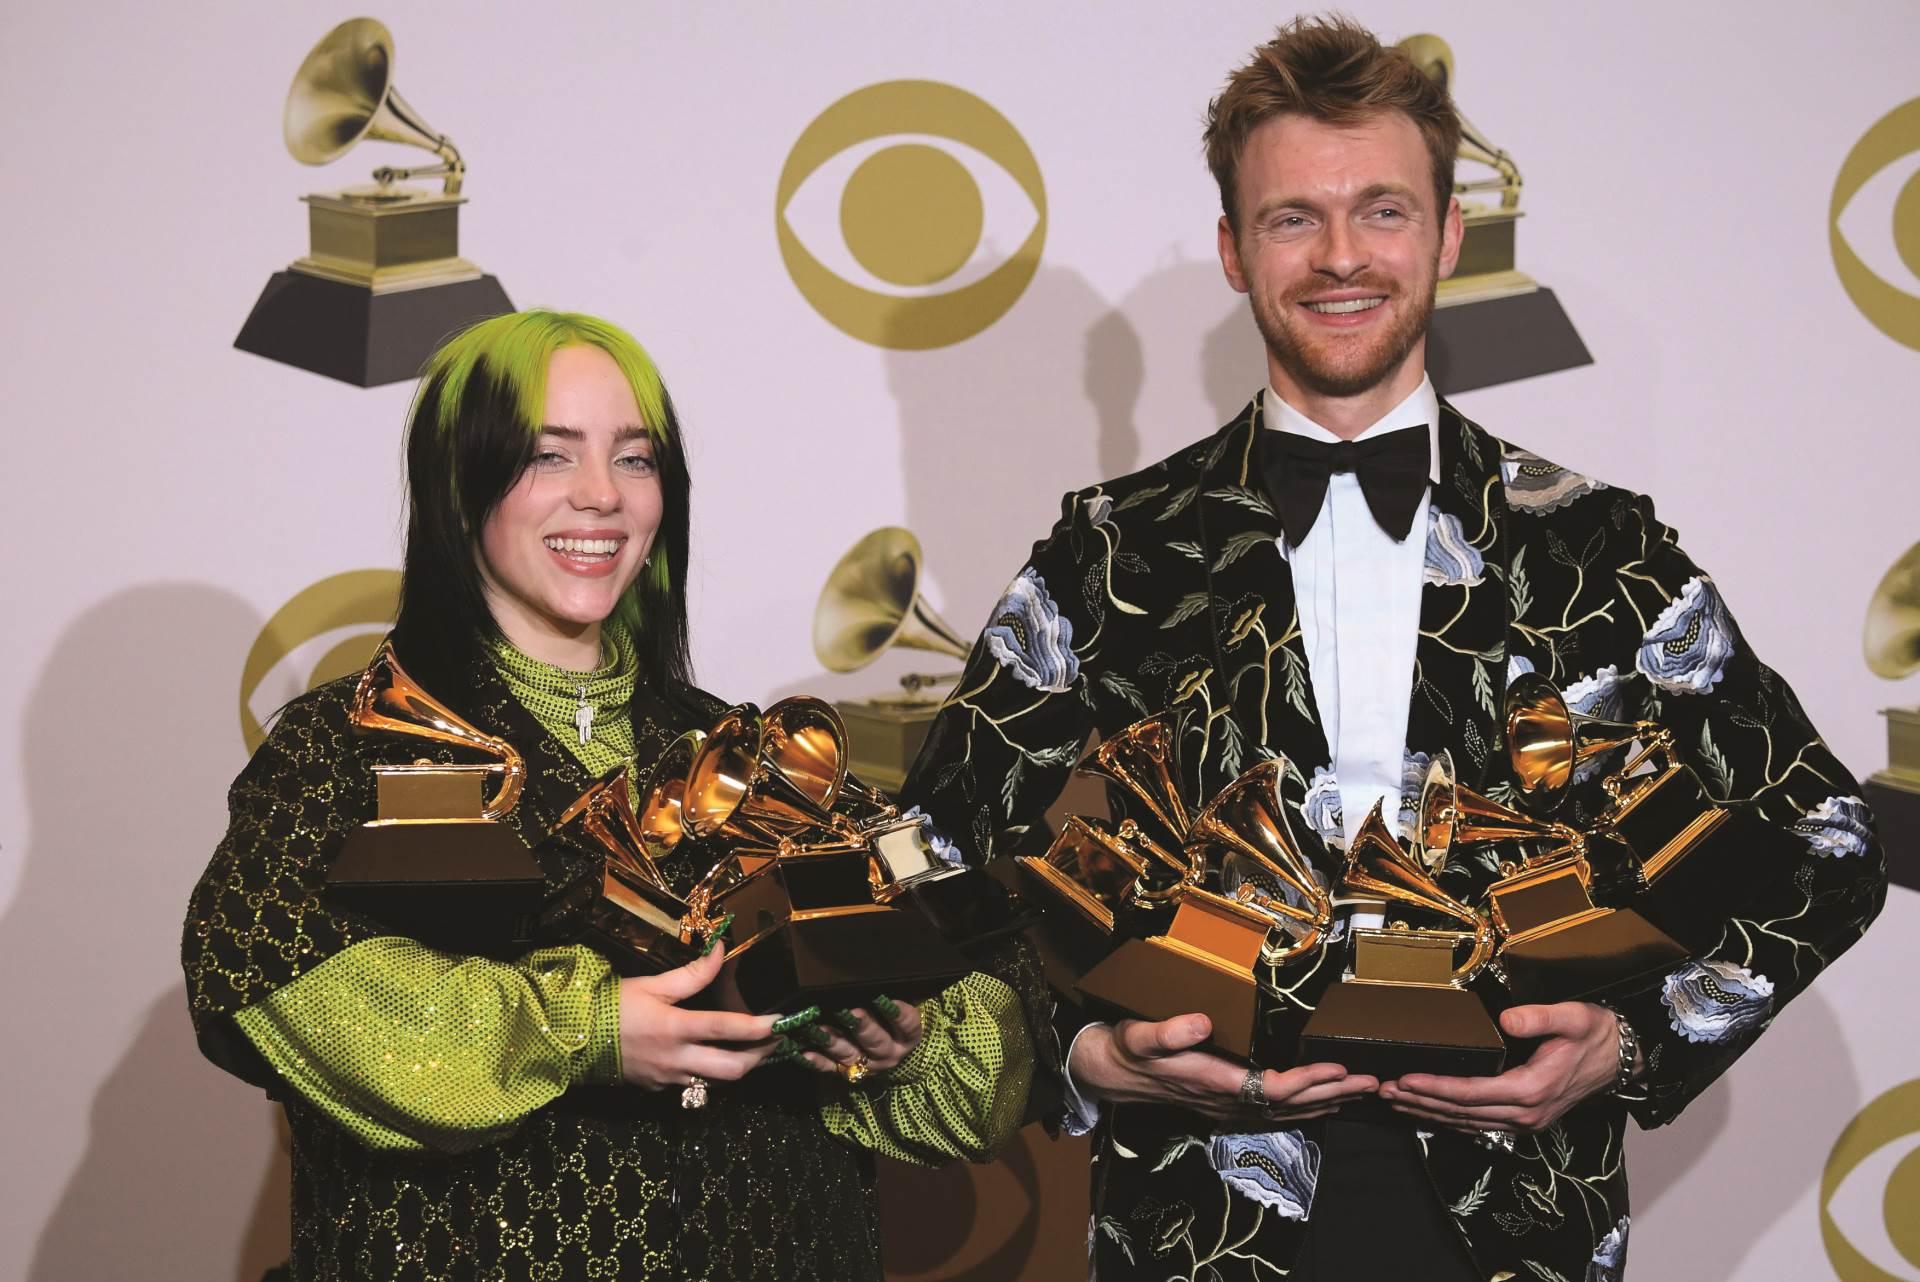 Billie je visestruka dobitnica Grammyja